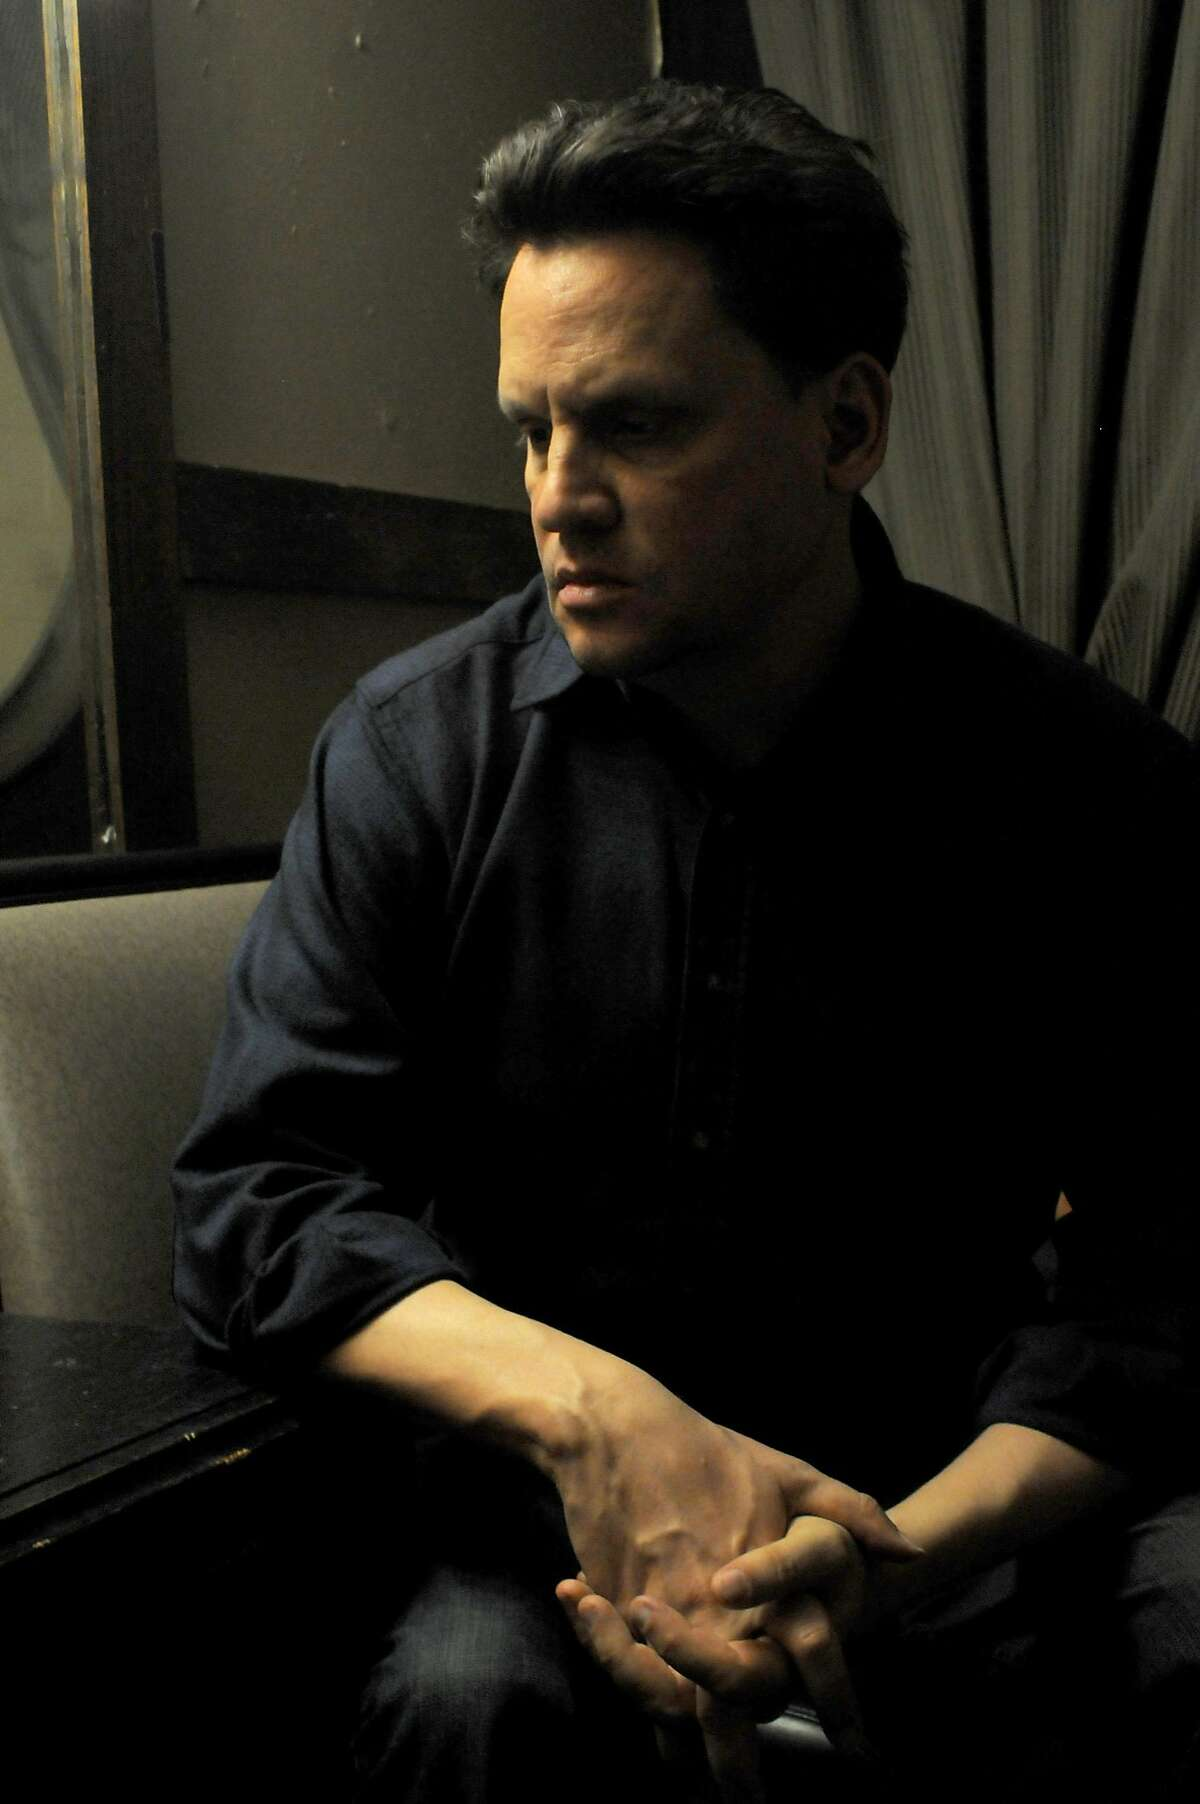 Mark Kozelek of Sun Kil Moon.